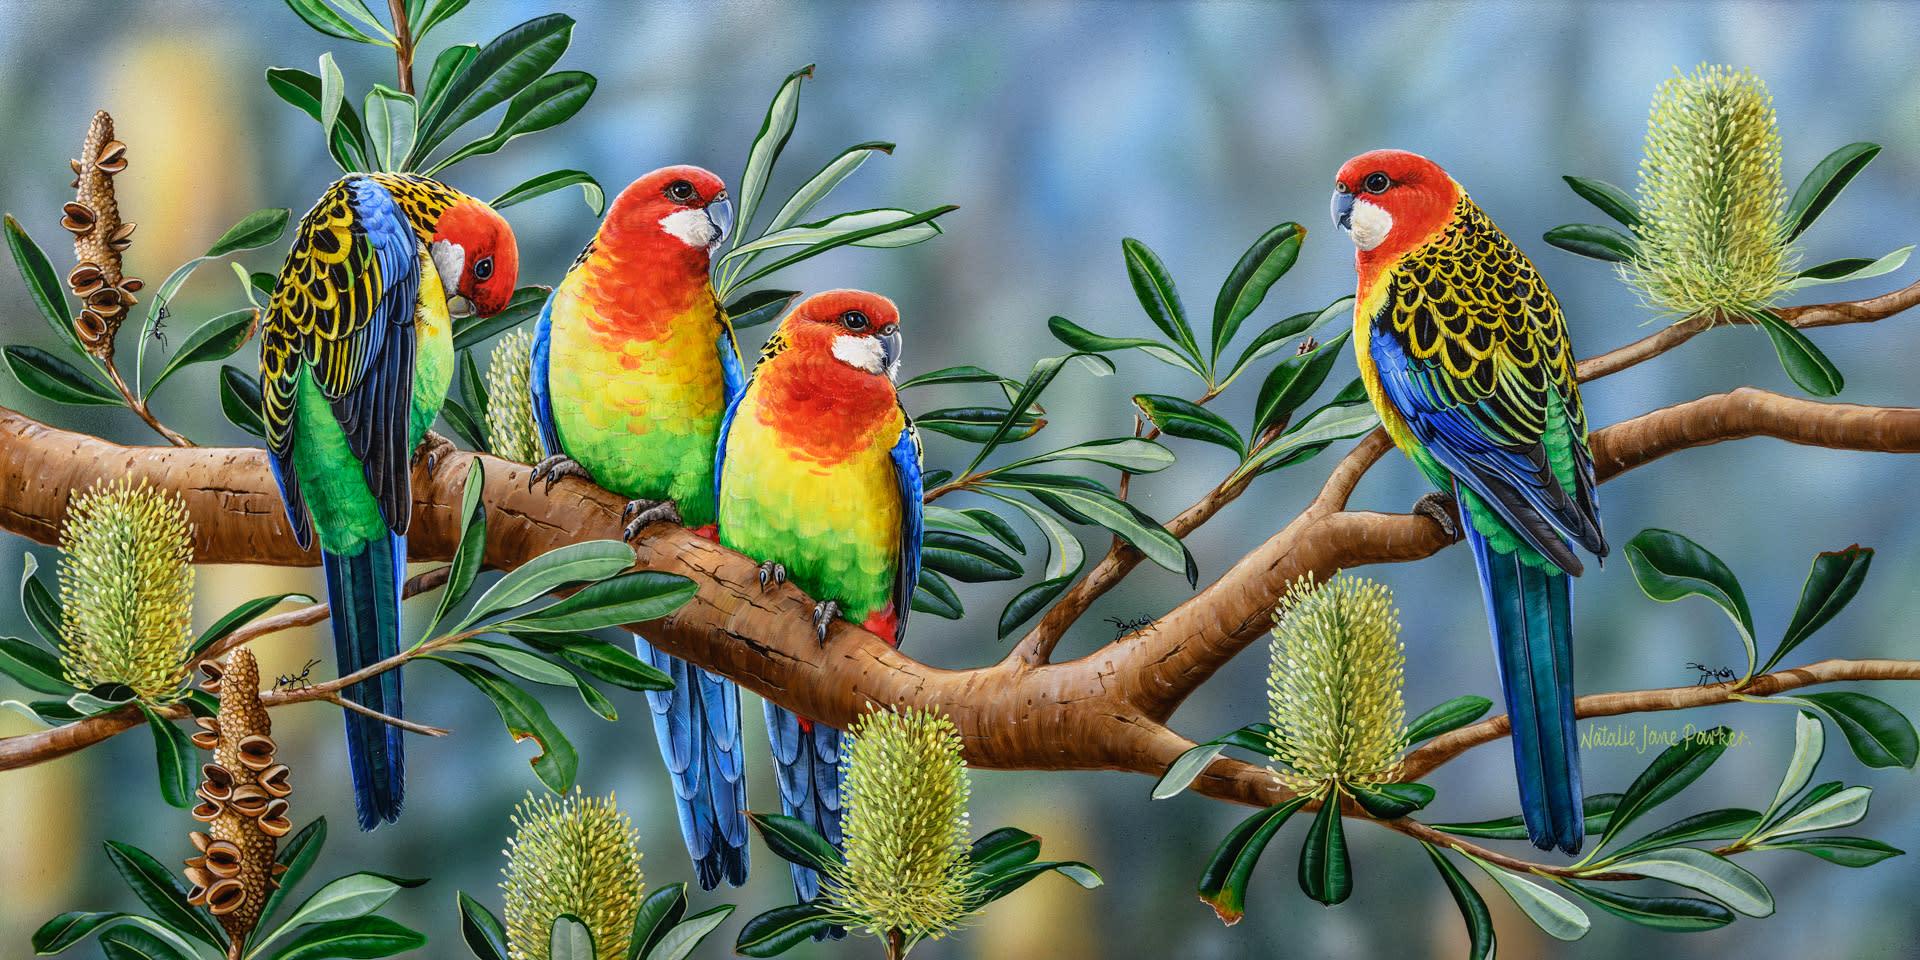 Banksia friends   eastern rosella natalie jane parker australian native wildlife nvqv23